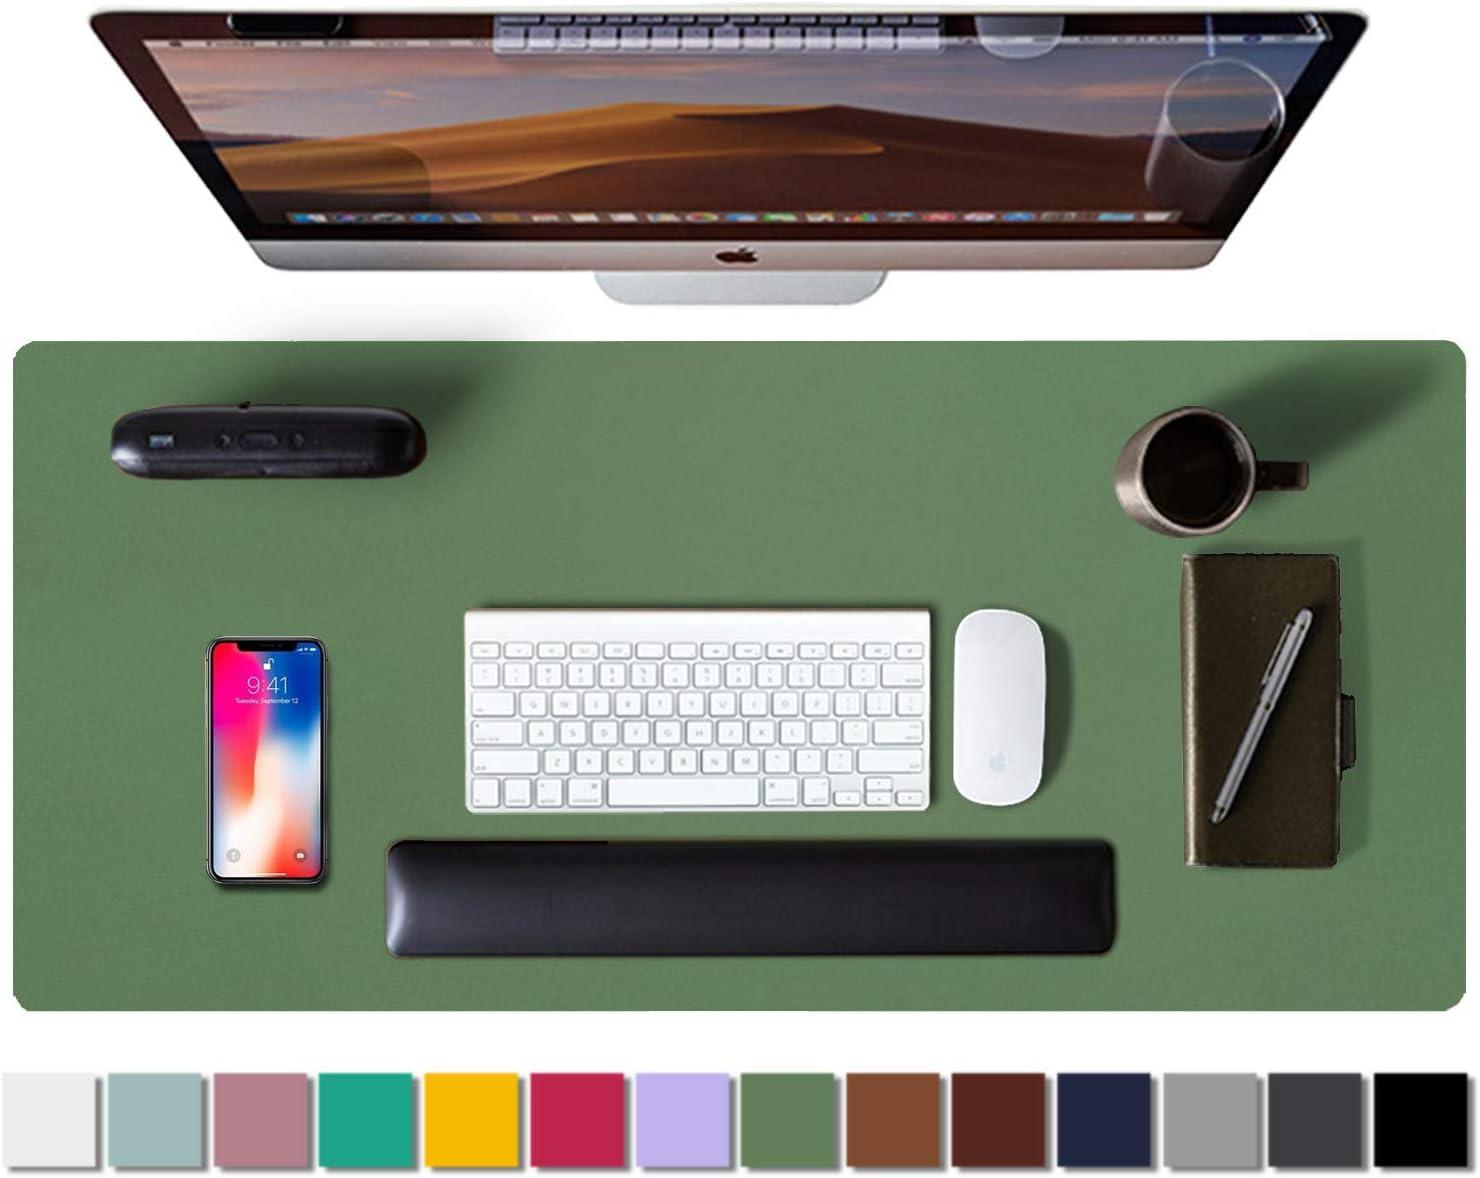 "Aothia 31.5"" x 15.7"" Leather Desk Pad Protector $11.89 Coupon"